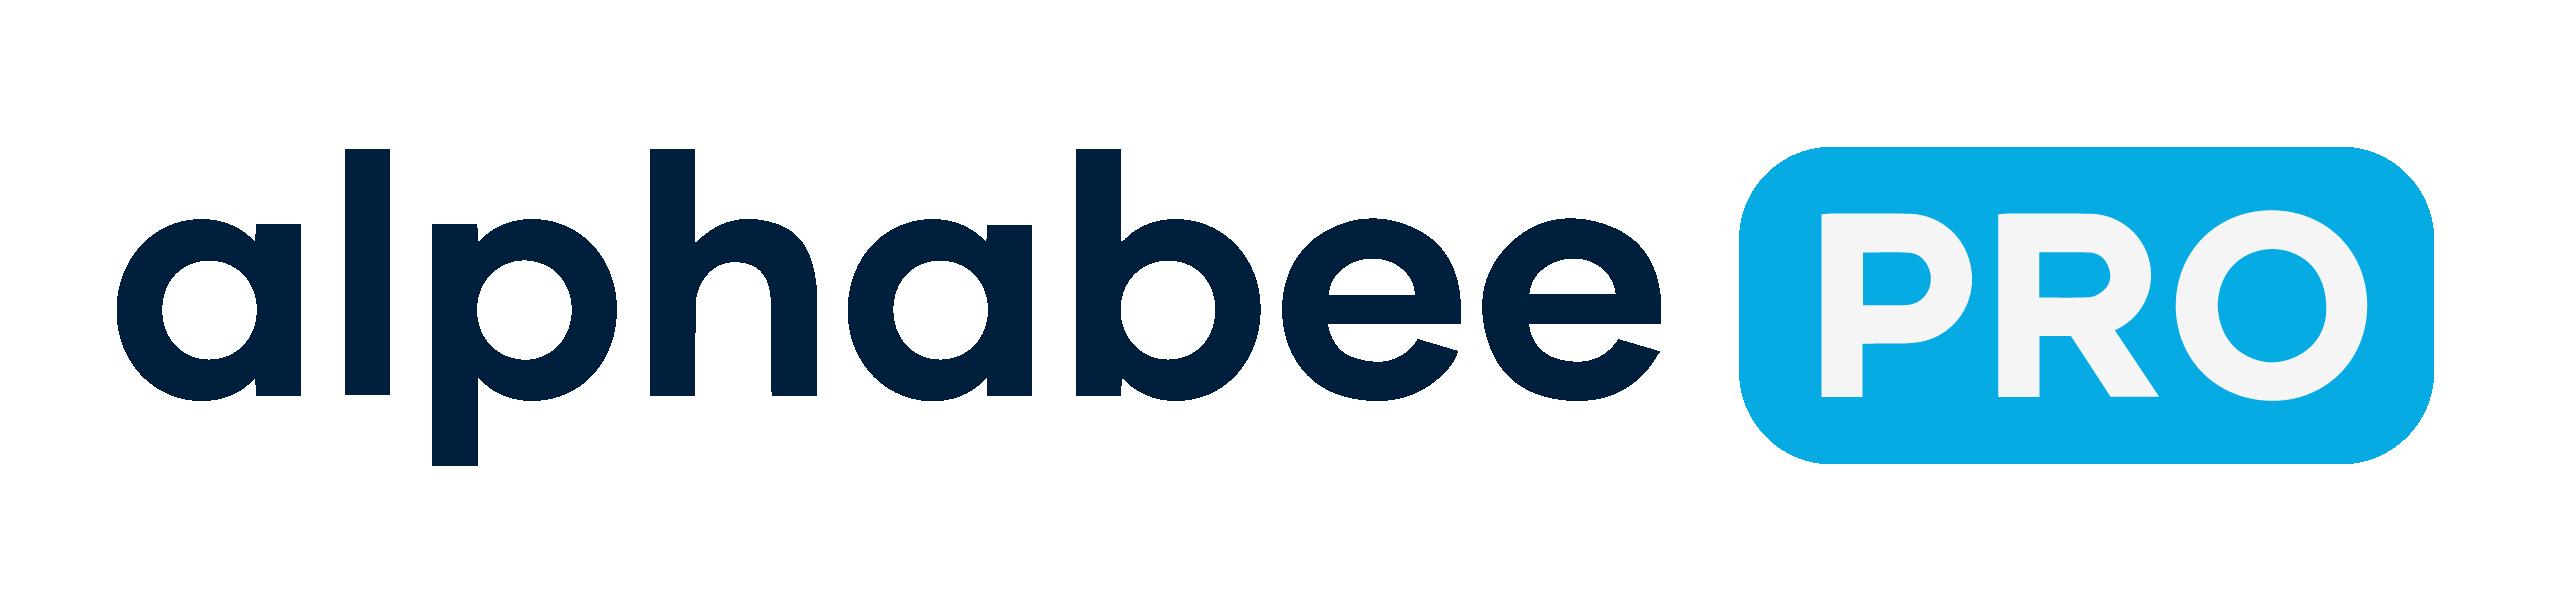 alphabeePRO